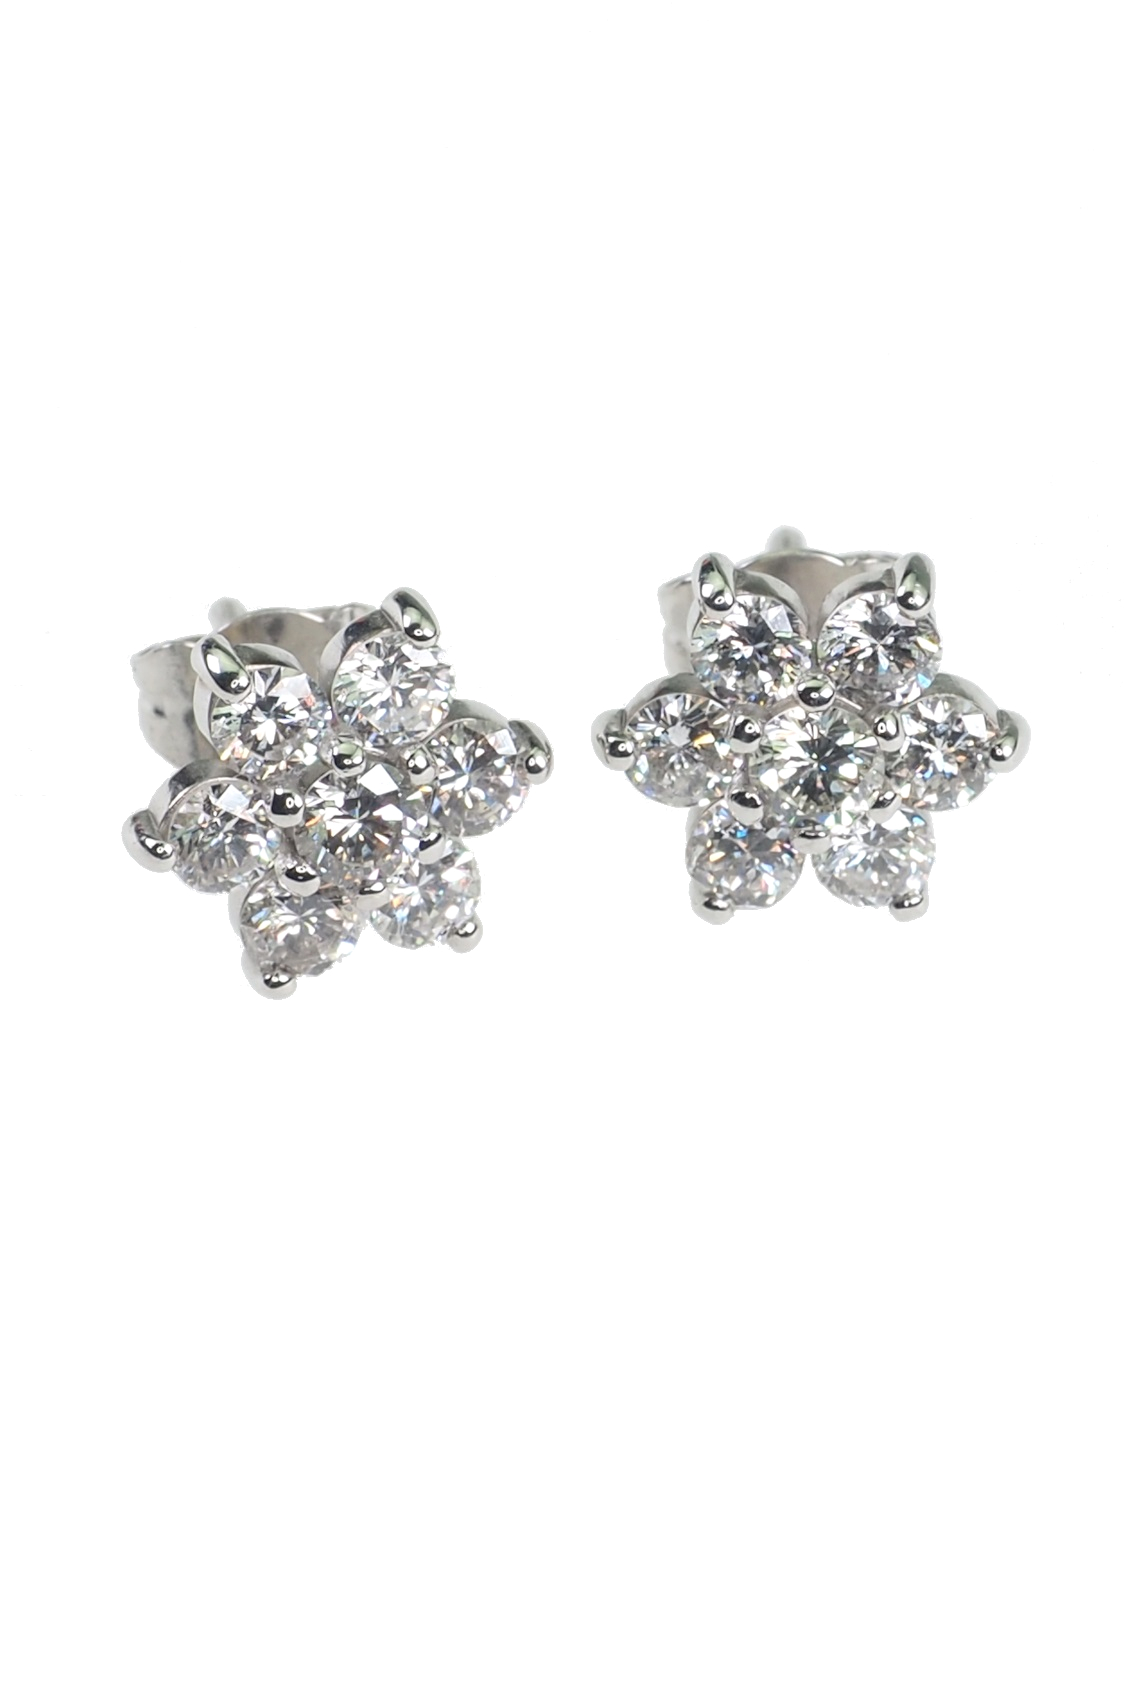 zertifizierter-Diamantschmuck-0281